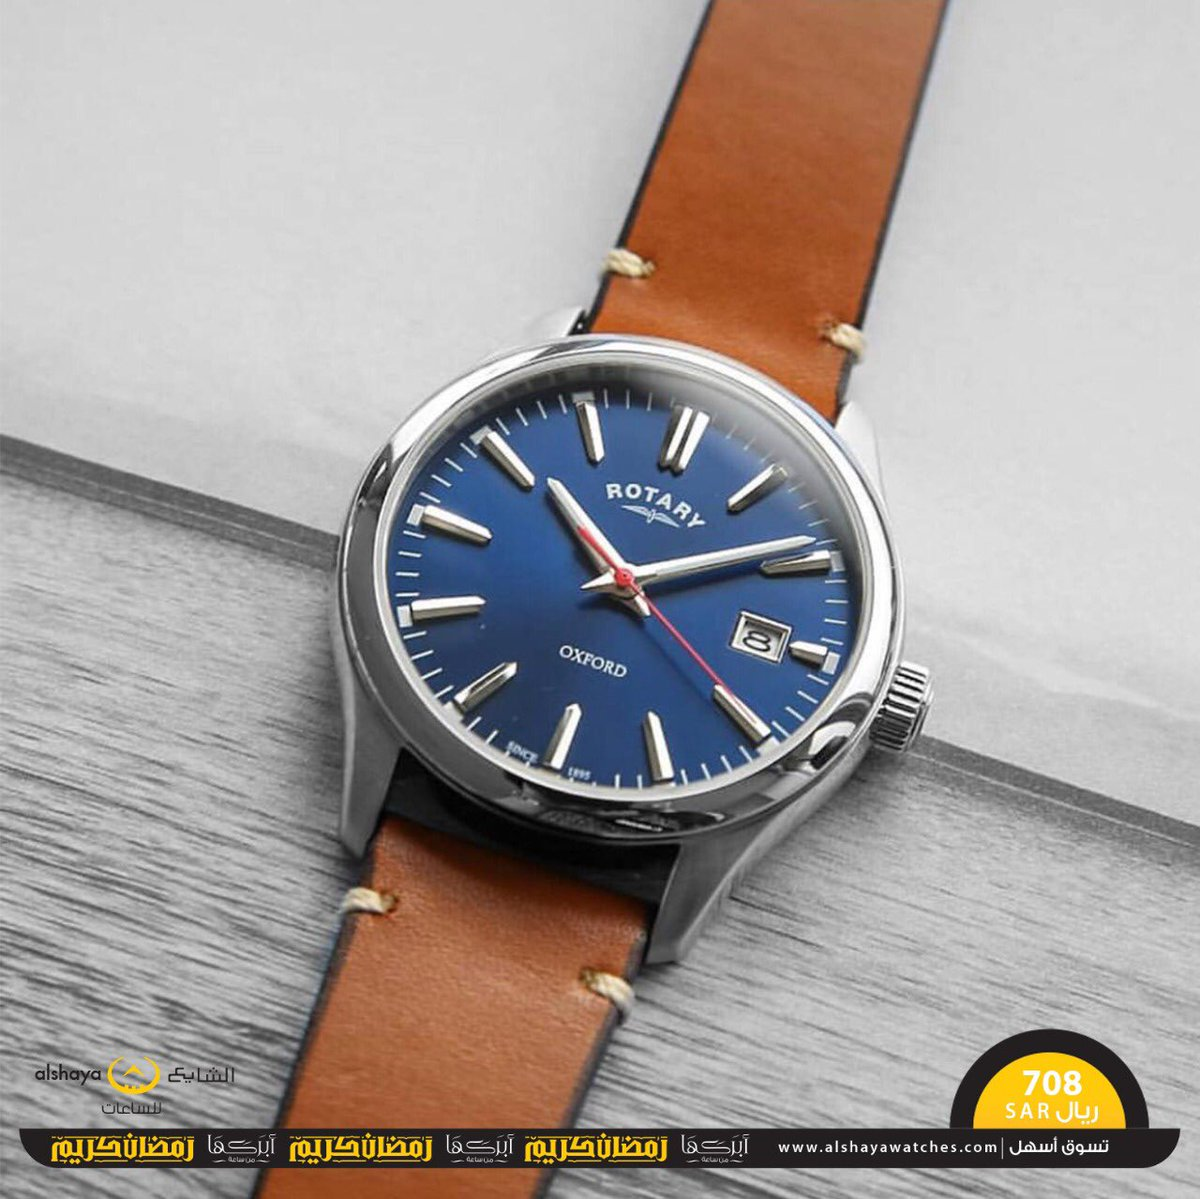 b348c01d0 ... الجريء بالتقليدية لينتج هذه الساعة #المبتكرة من ROTARY، حزام من الجلد و  ميناء باللون الأزرق الداكن يقابله حواف مطلية بالفضي تزيدك #أناقة و حيوية .